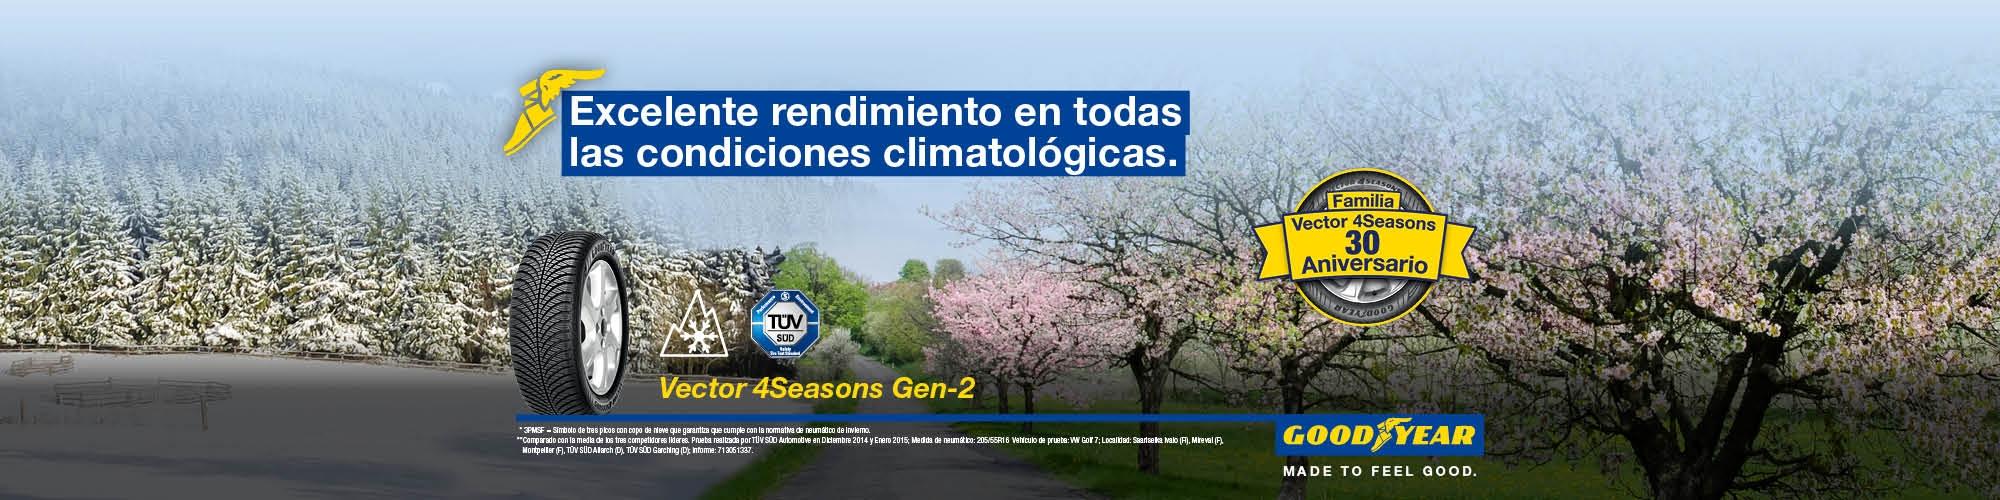 All season - Goodyear Vector 4Seasons Gen-2